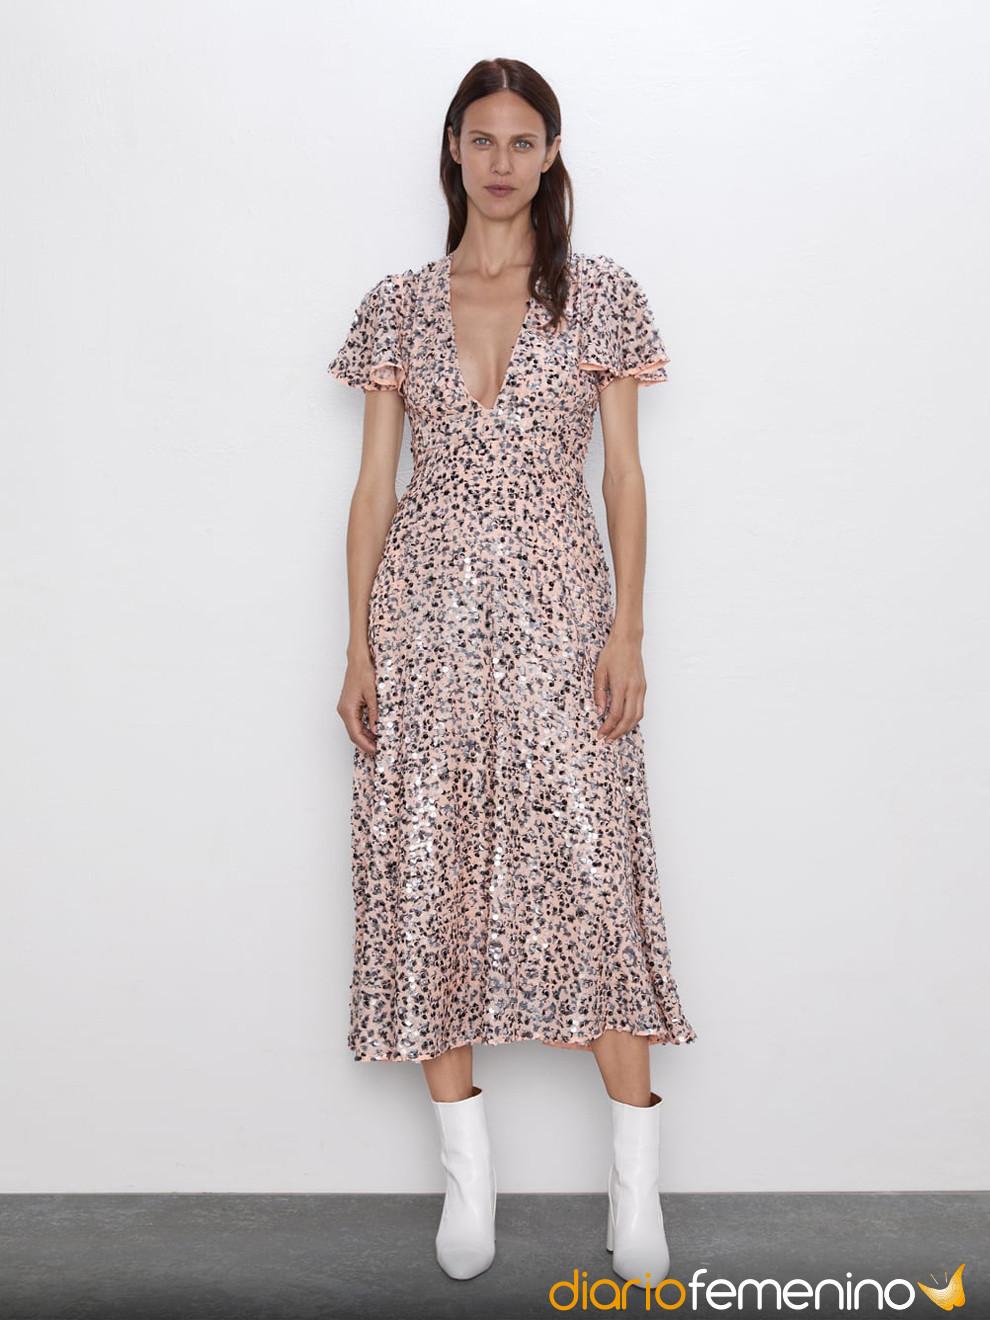 Romántico Vestido Rosa De Zara Para Nochevieja 2019 2020